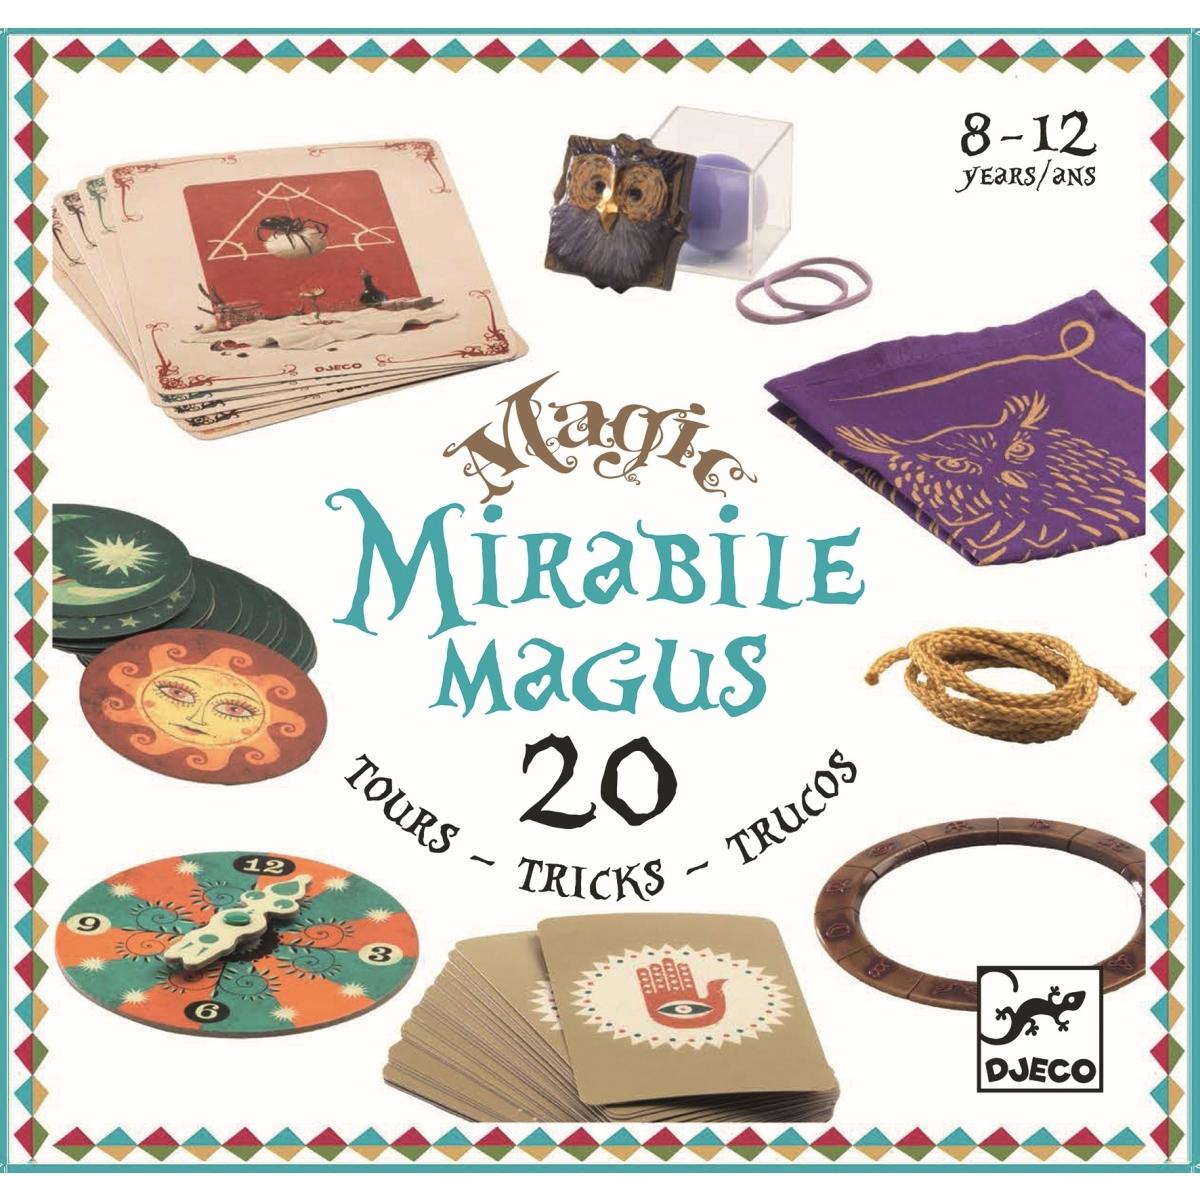 Djeco - Zauberkasten Mirabile magus